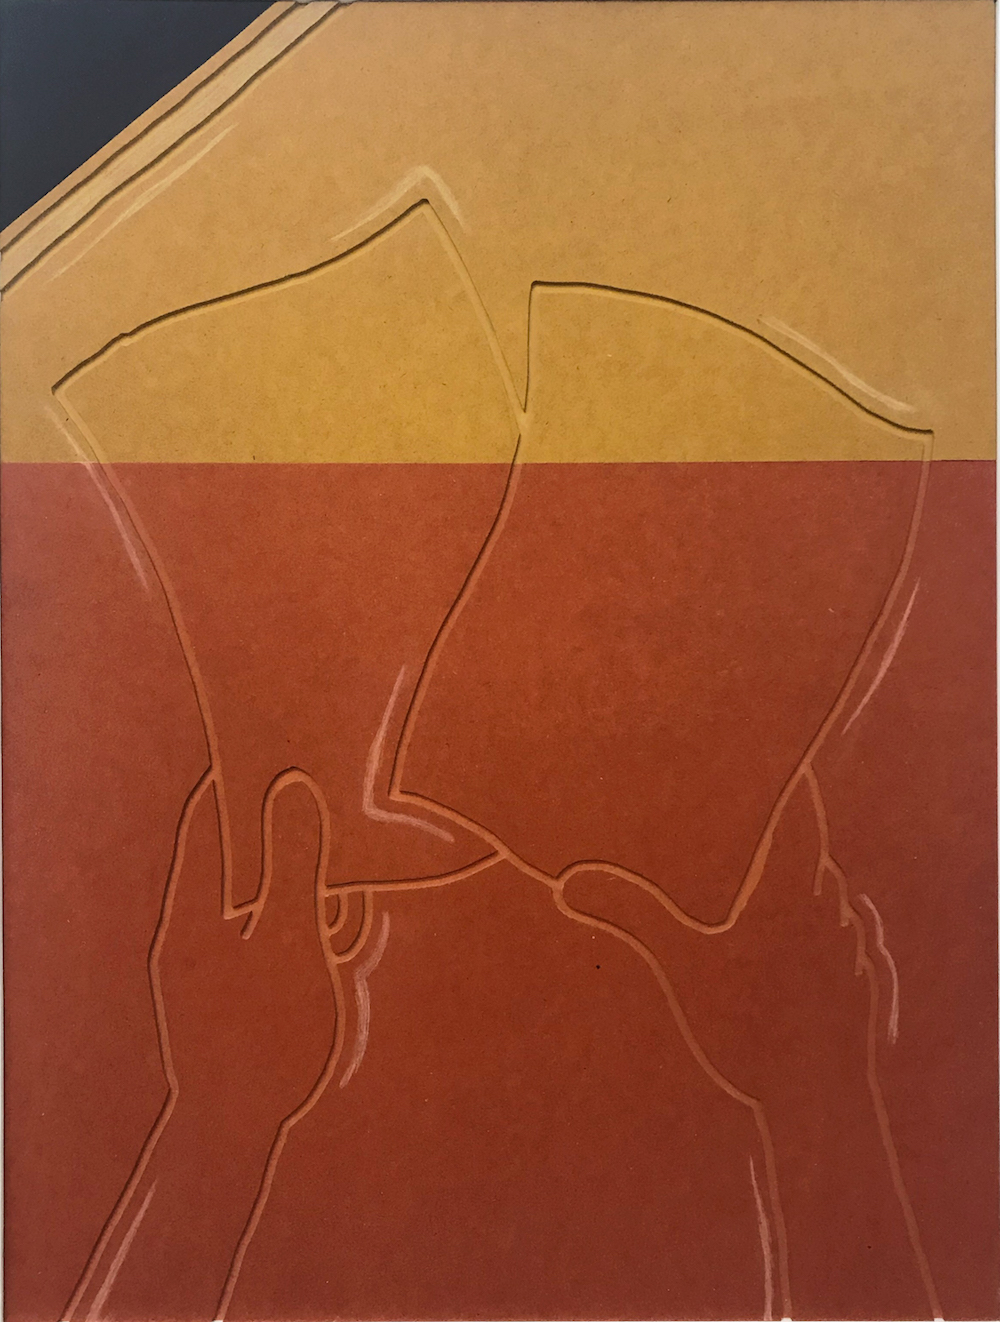 Milly Peck, Spot Effect: Shuffle, 2019. Valchromat. 78 x 59 x 5 cm.